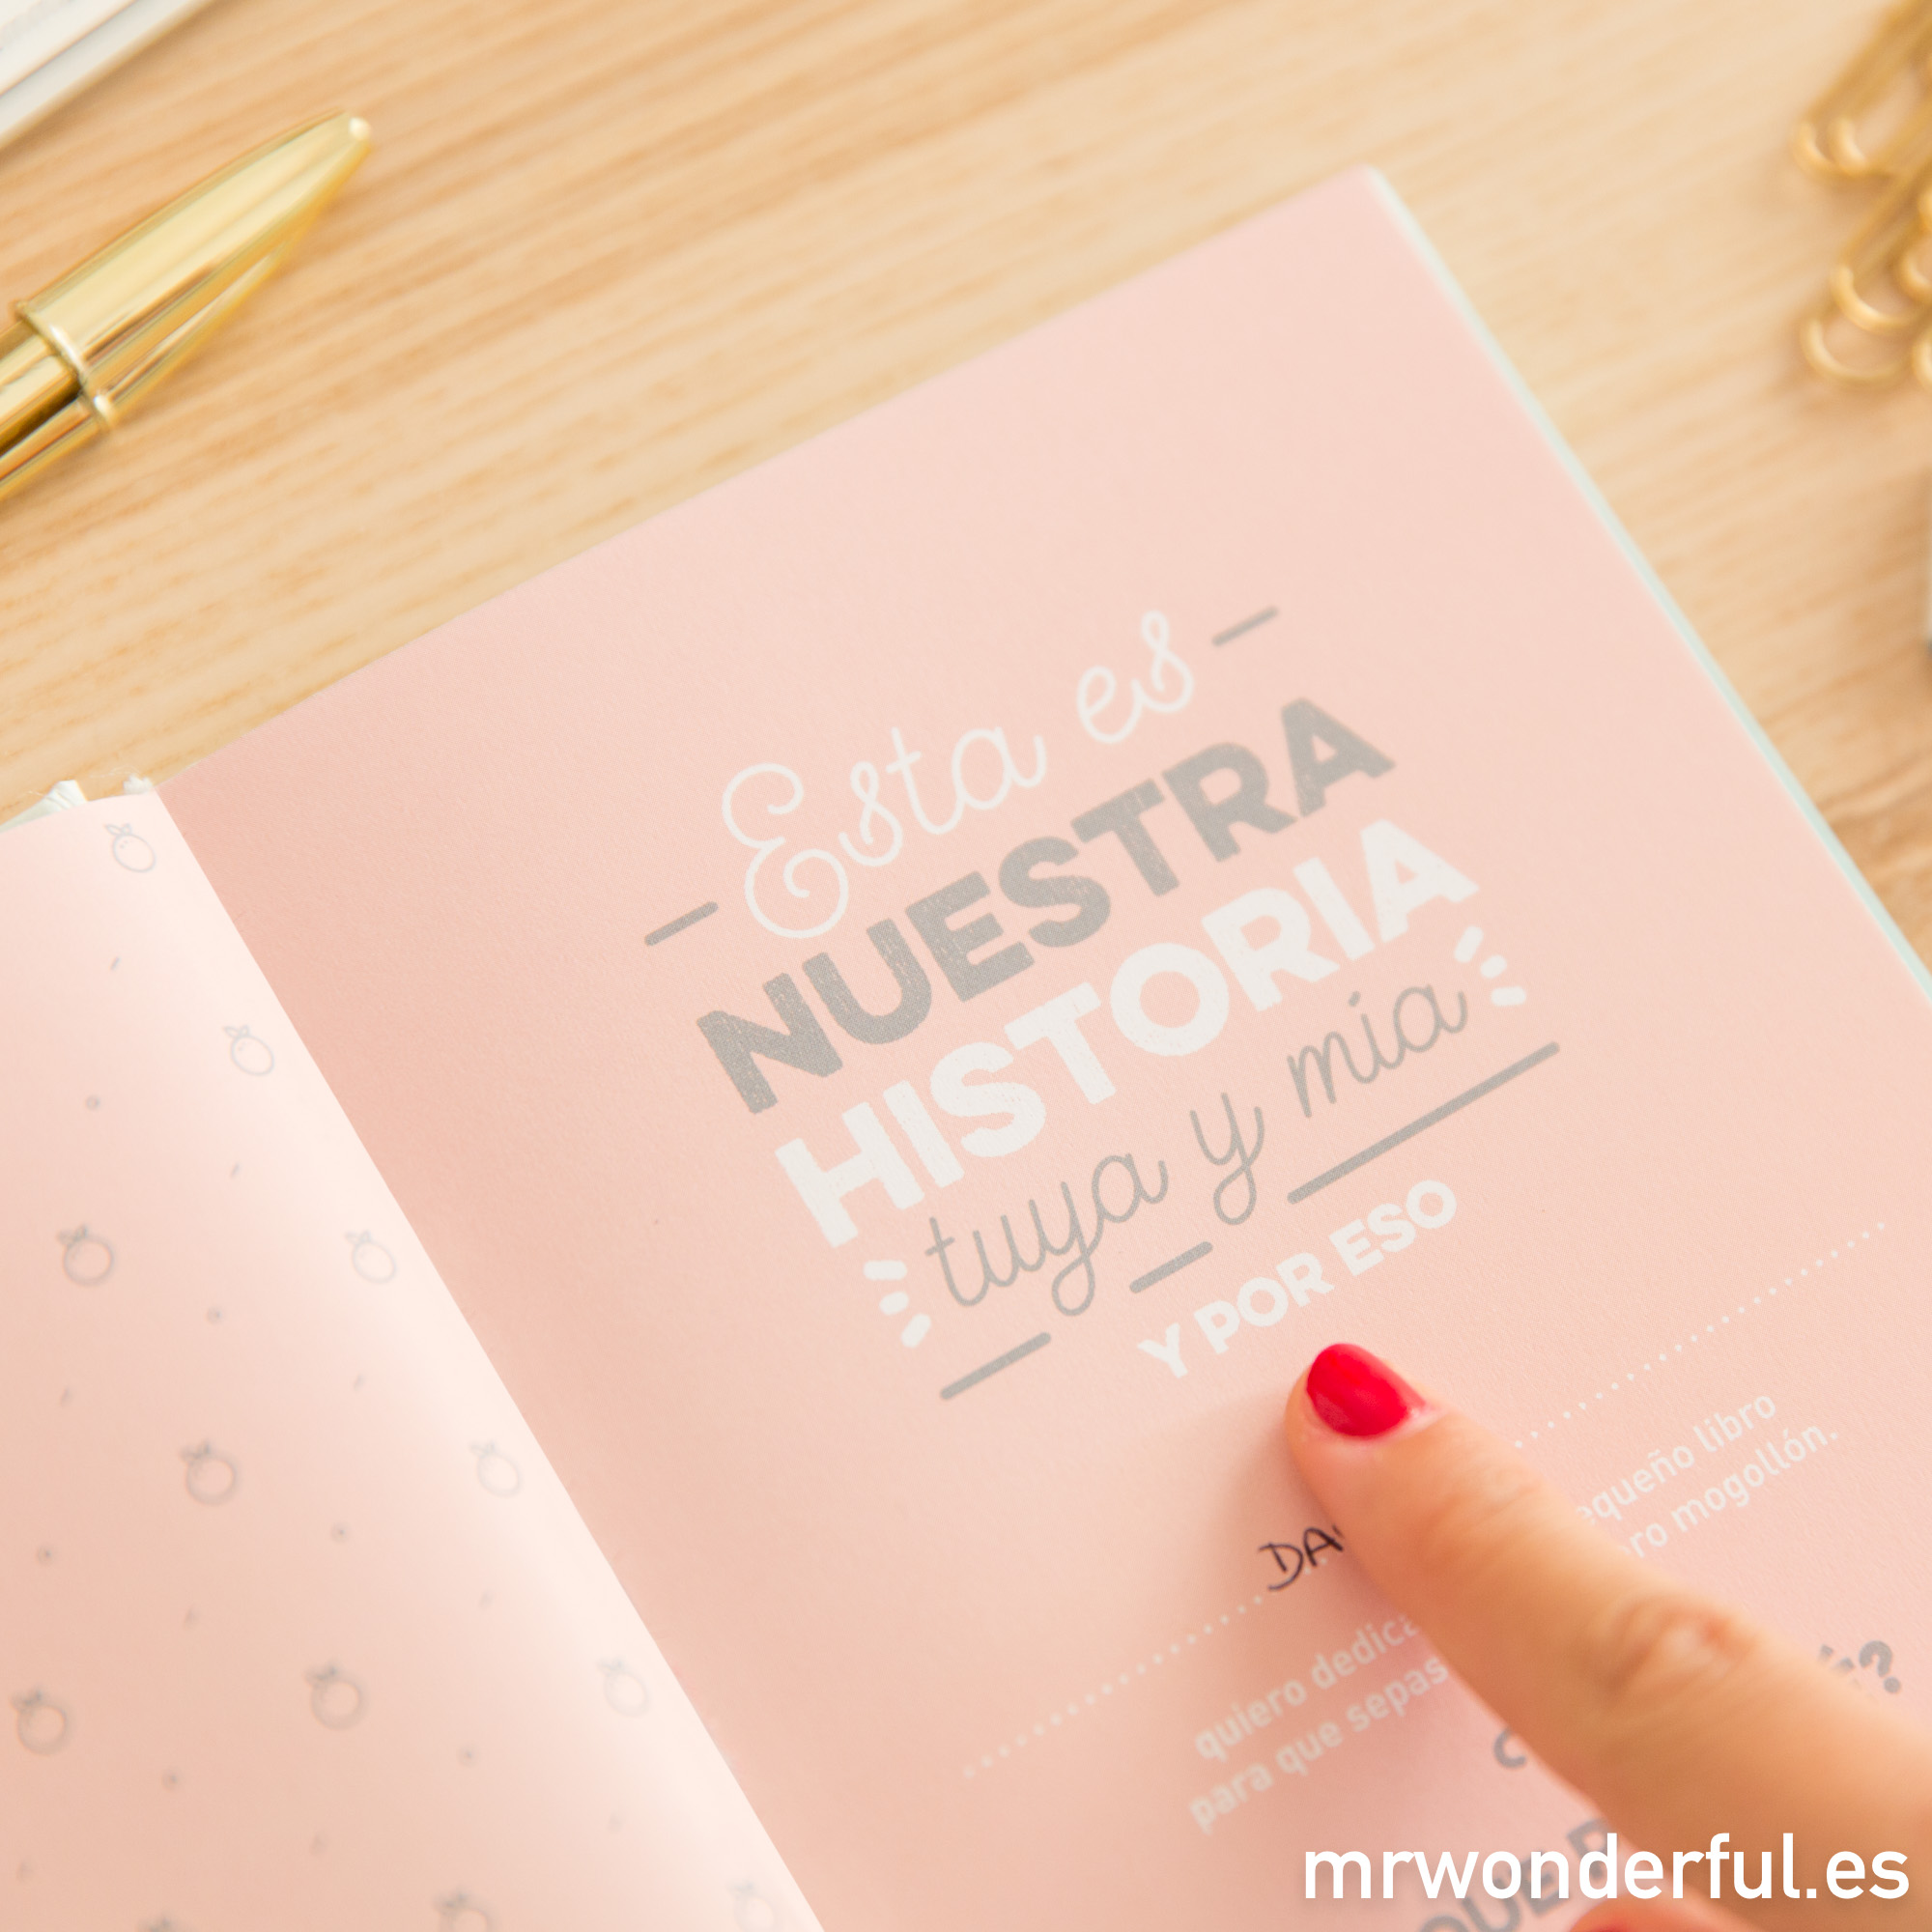 mrwonderful_8435460709941_libro-historias-tuyas-mias_es_2017-10-editar